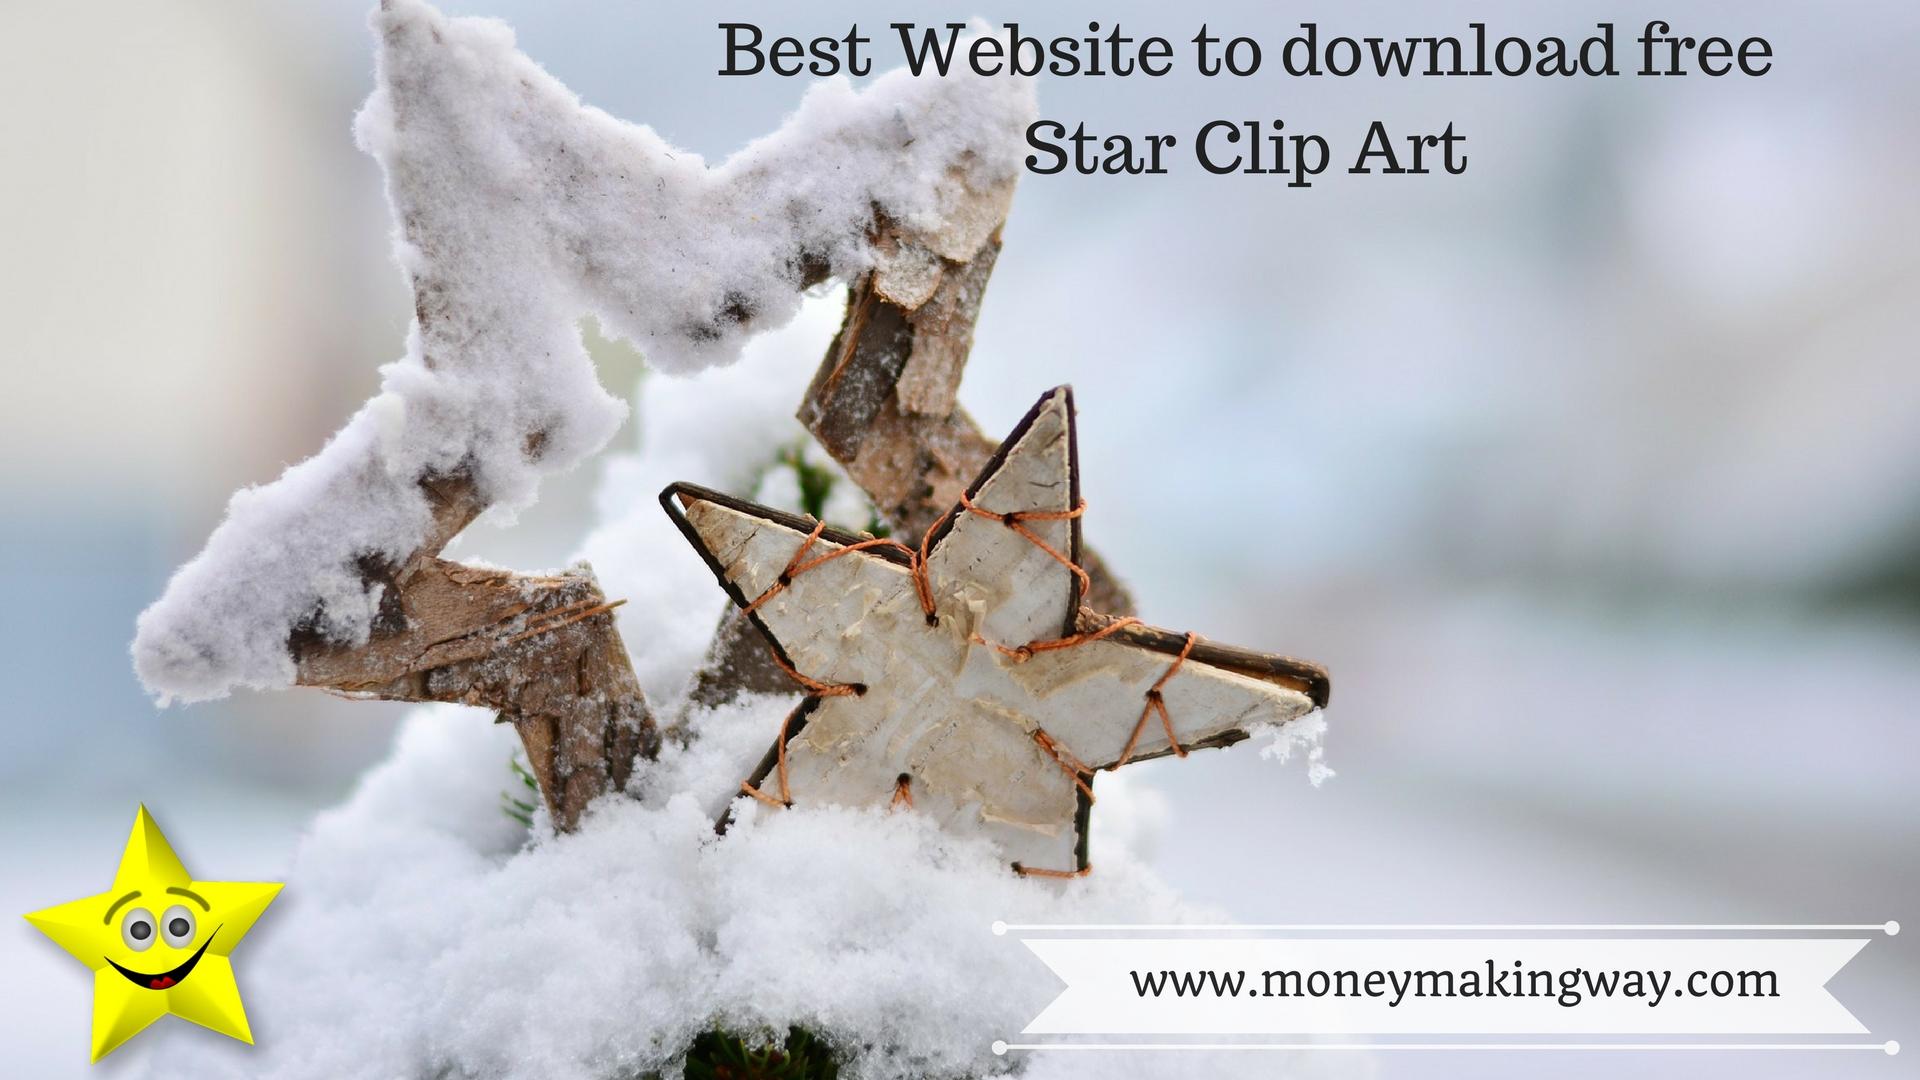 5 Best places to download Star clip Art - sheknowsfinance